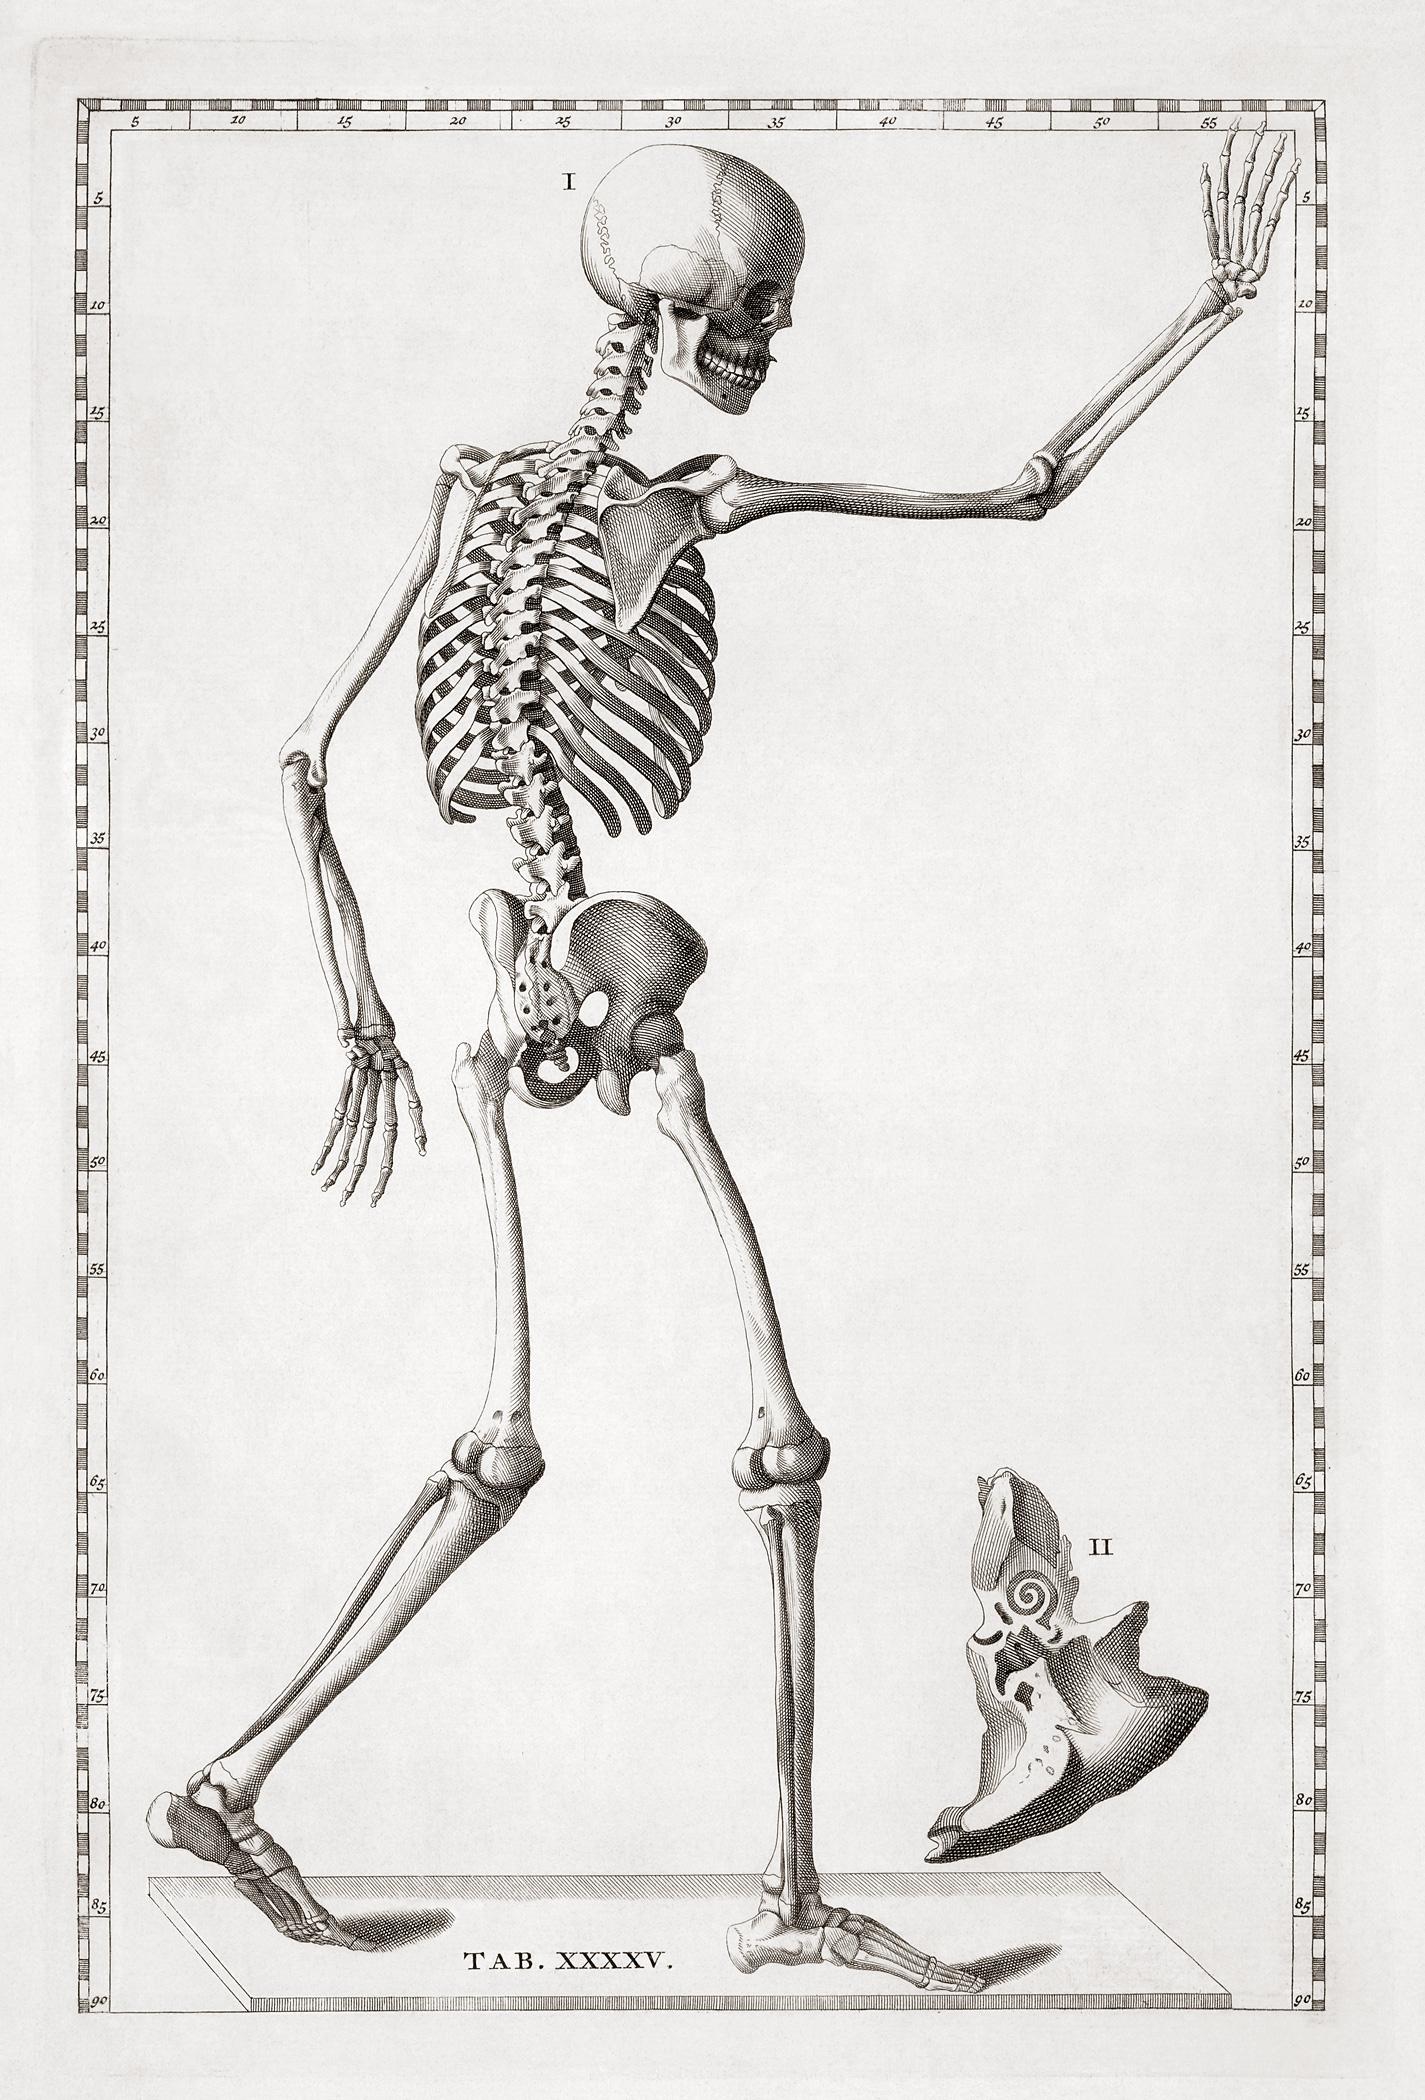 Free Vintage Anatomy Ephemera Archives - The Graffical Muse